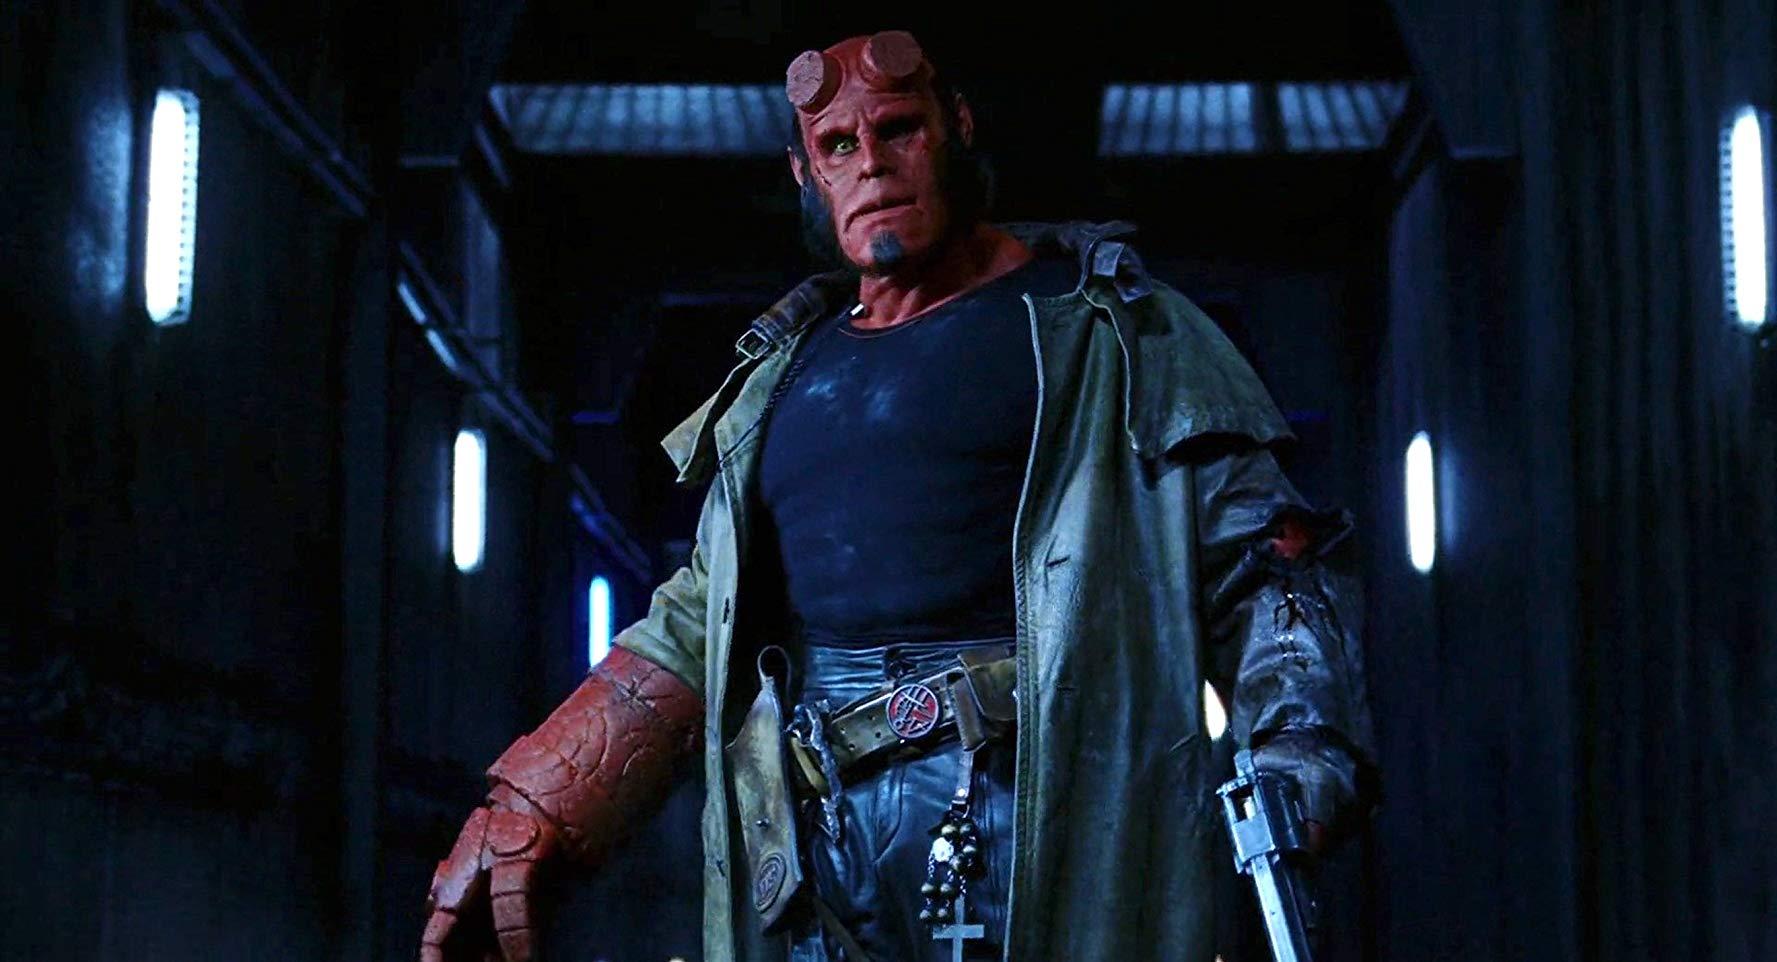 Ron Perlman as Hellboy (2004)